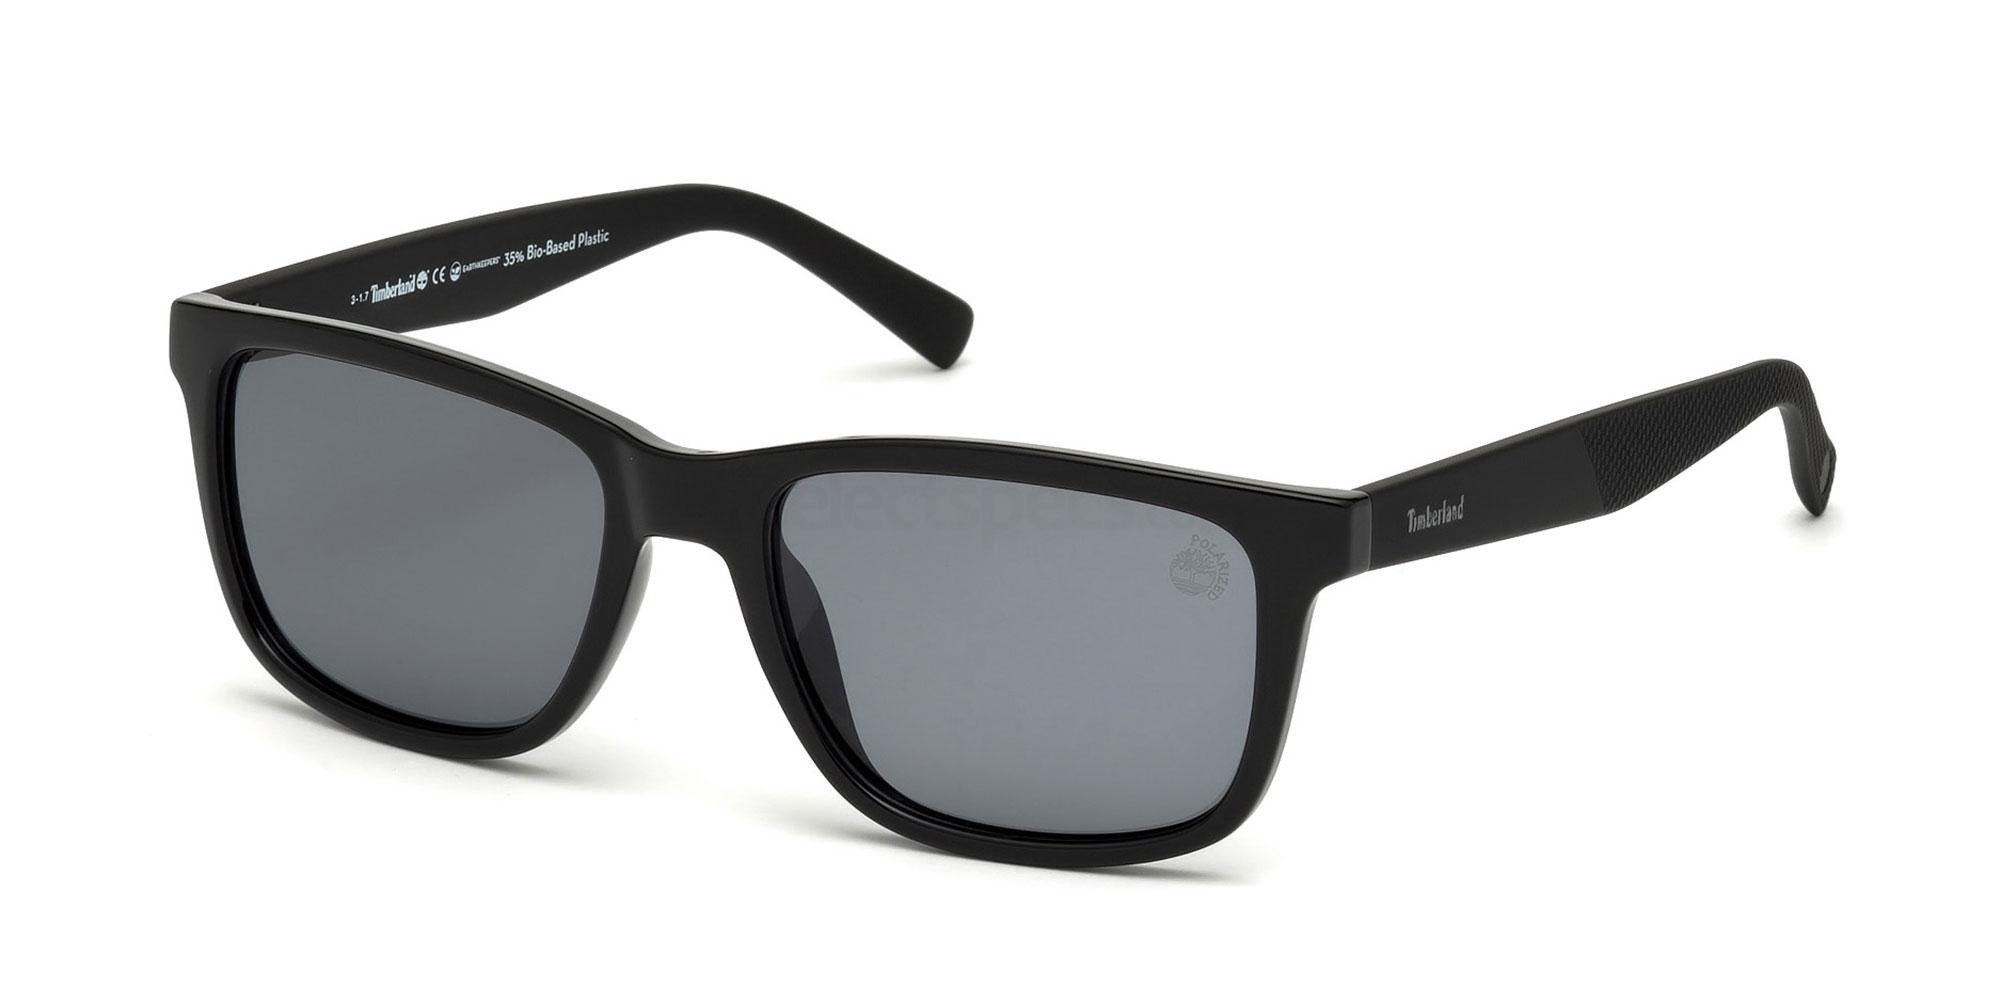 01D TB9125 Sunglasses, Timberland